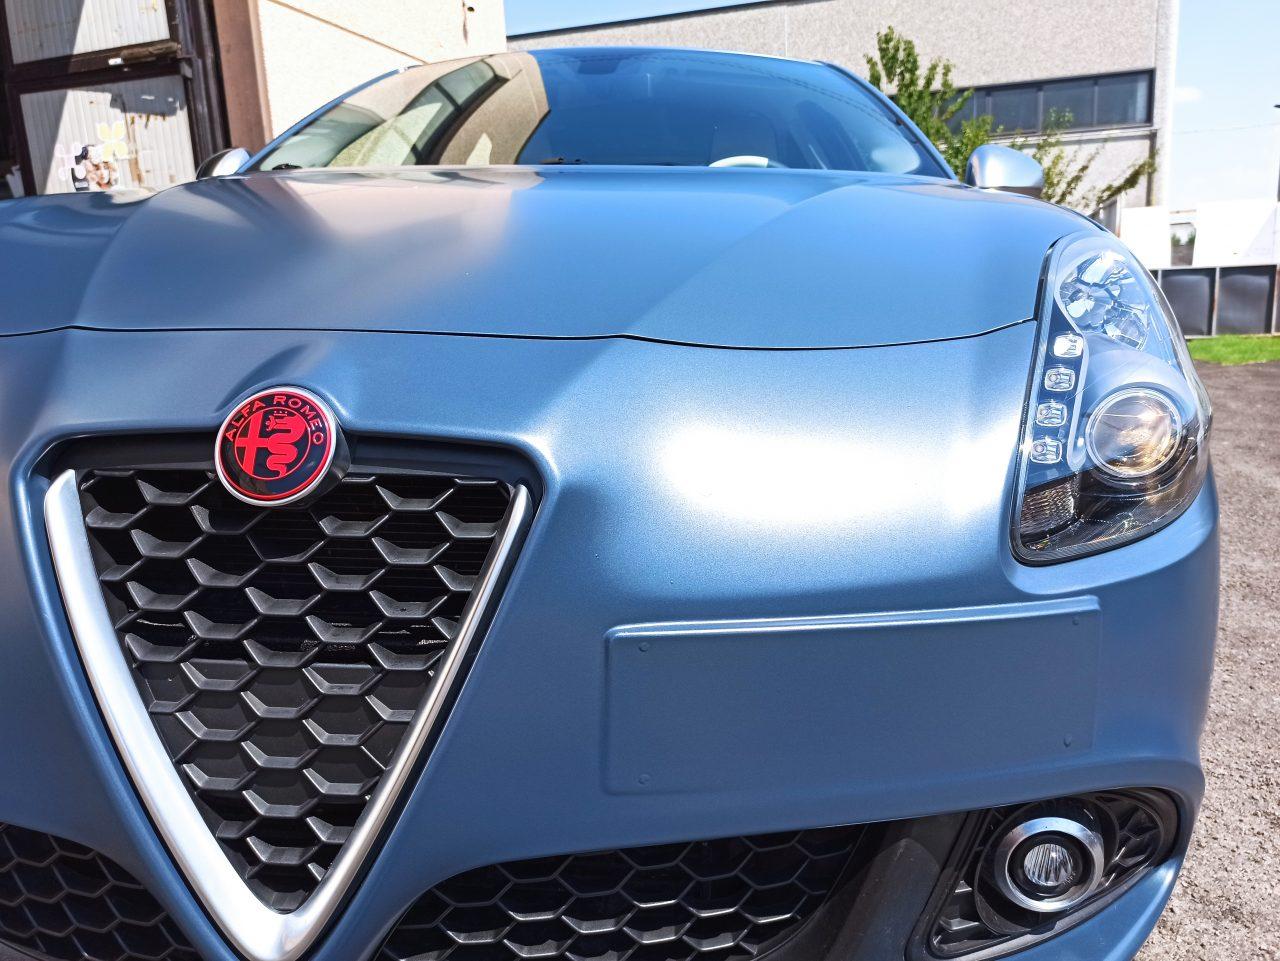 Alfa Romeo Supercar wrapping cantarelli group